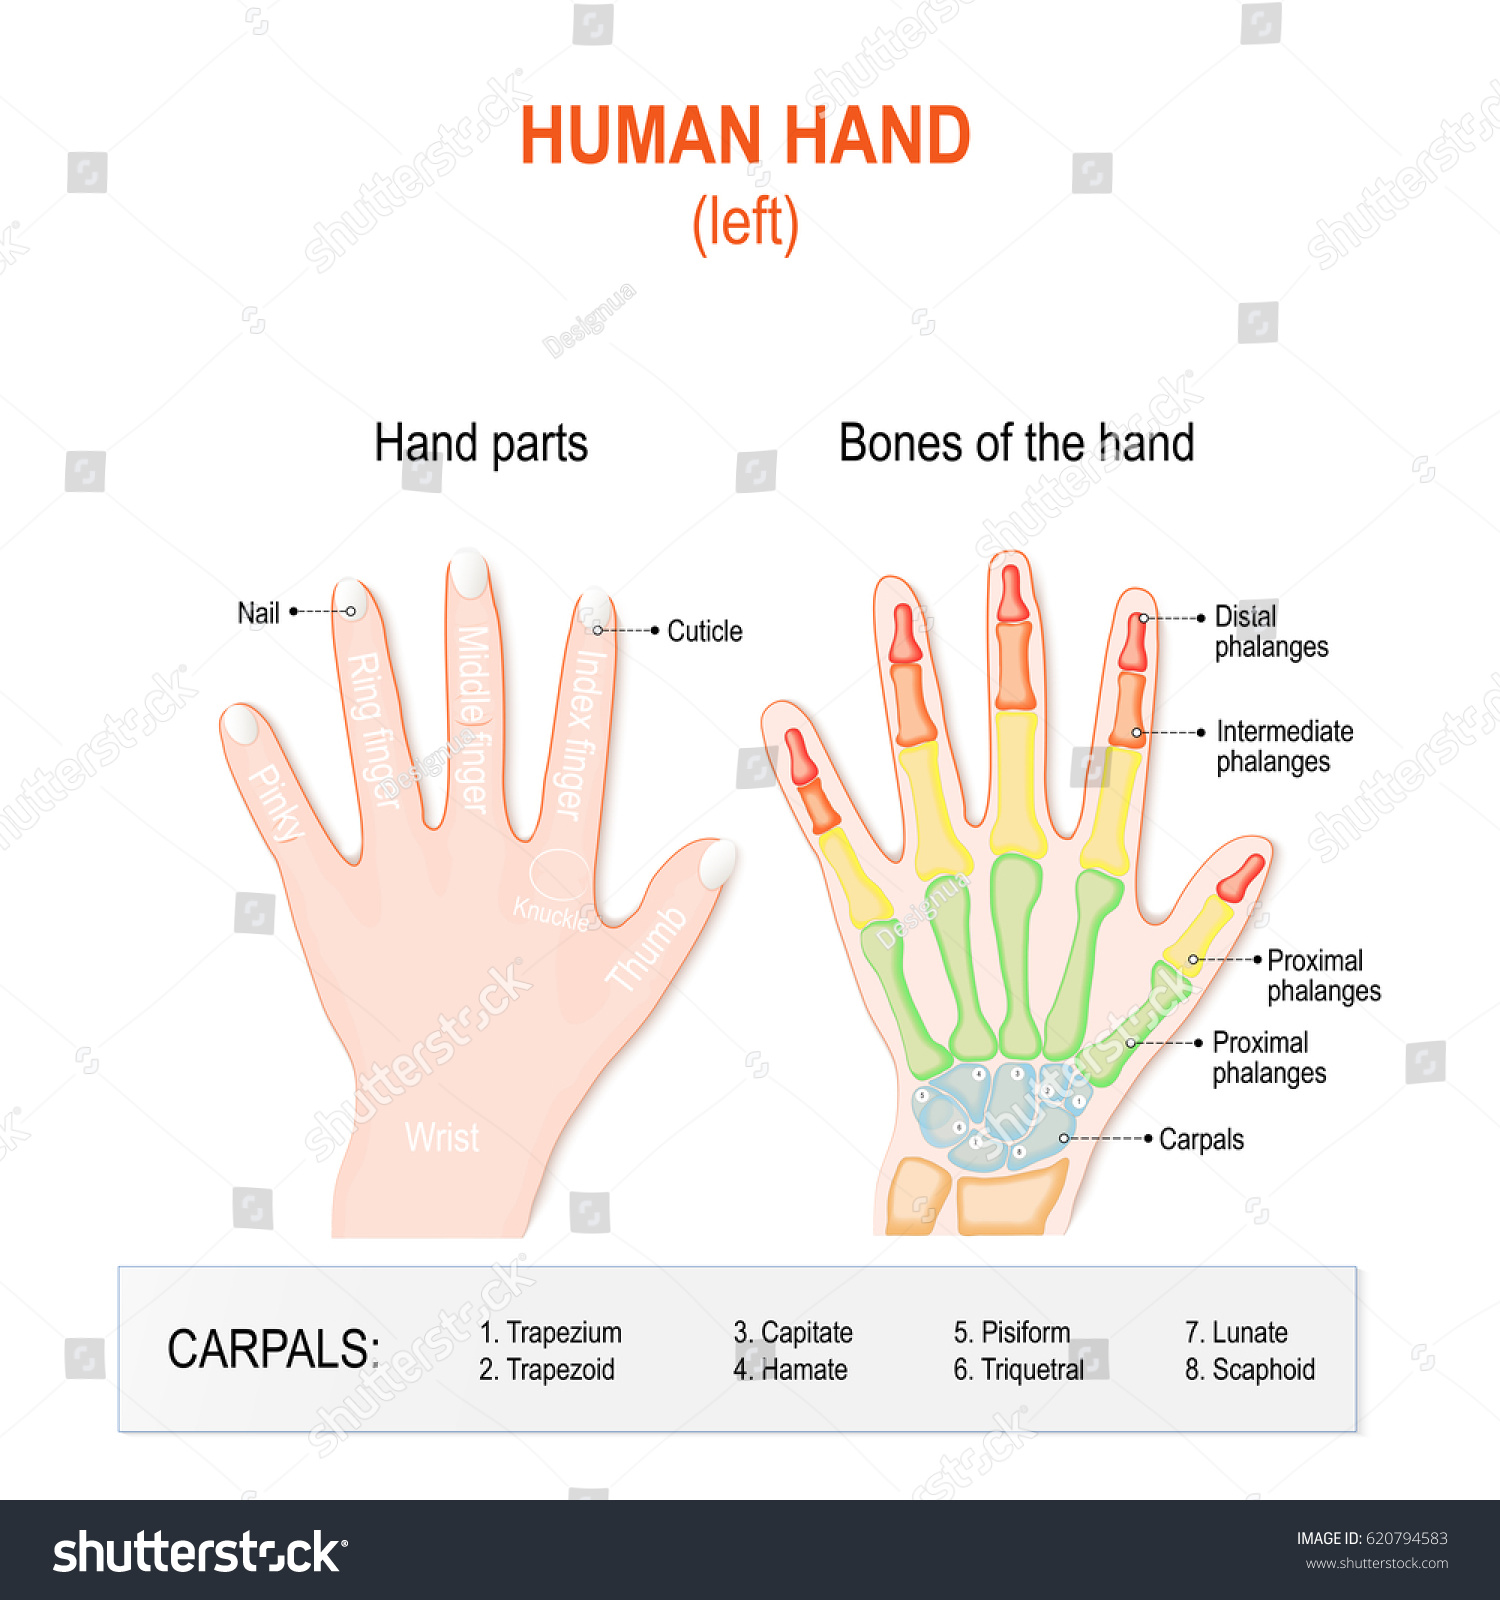 Human Hand Parts Bones Left Hand Stock Illustration 620794583 ...